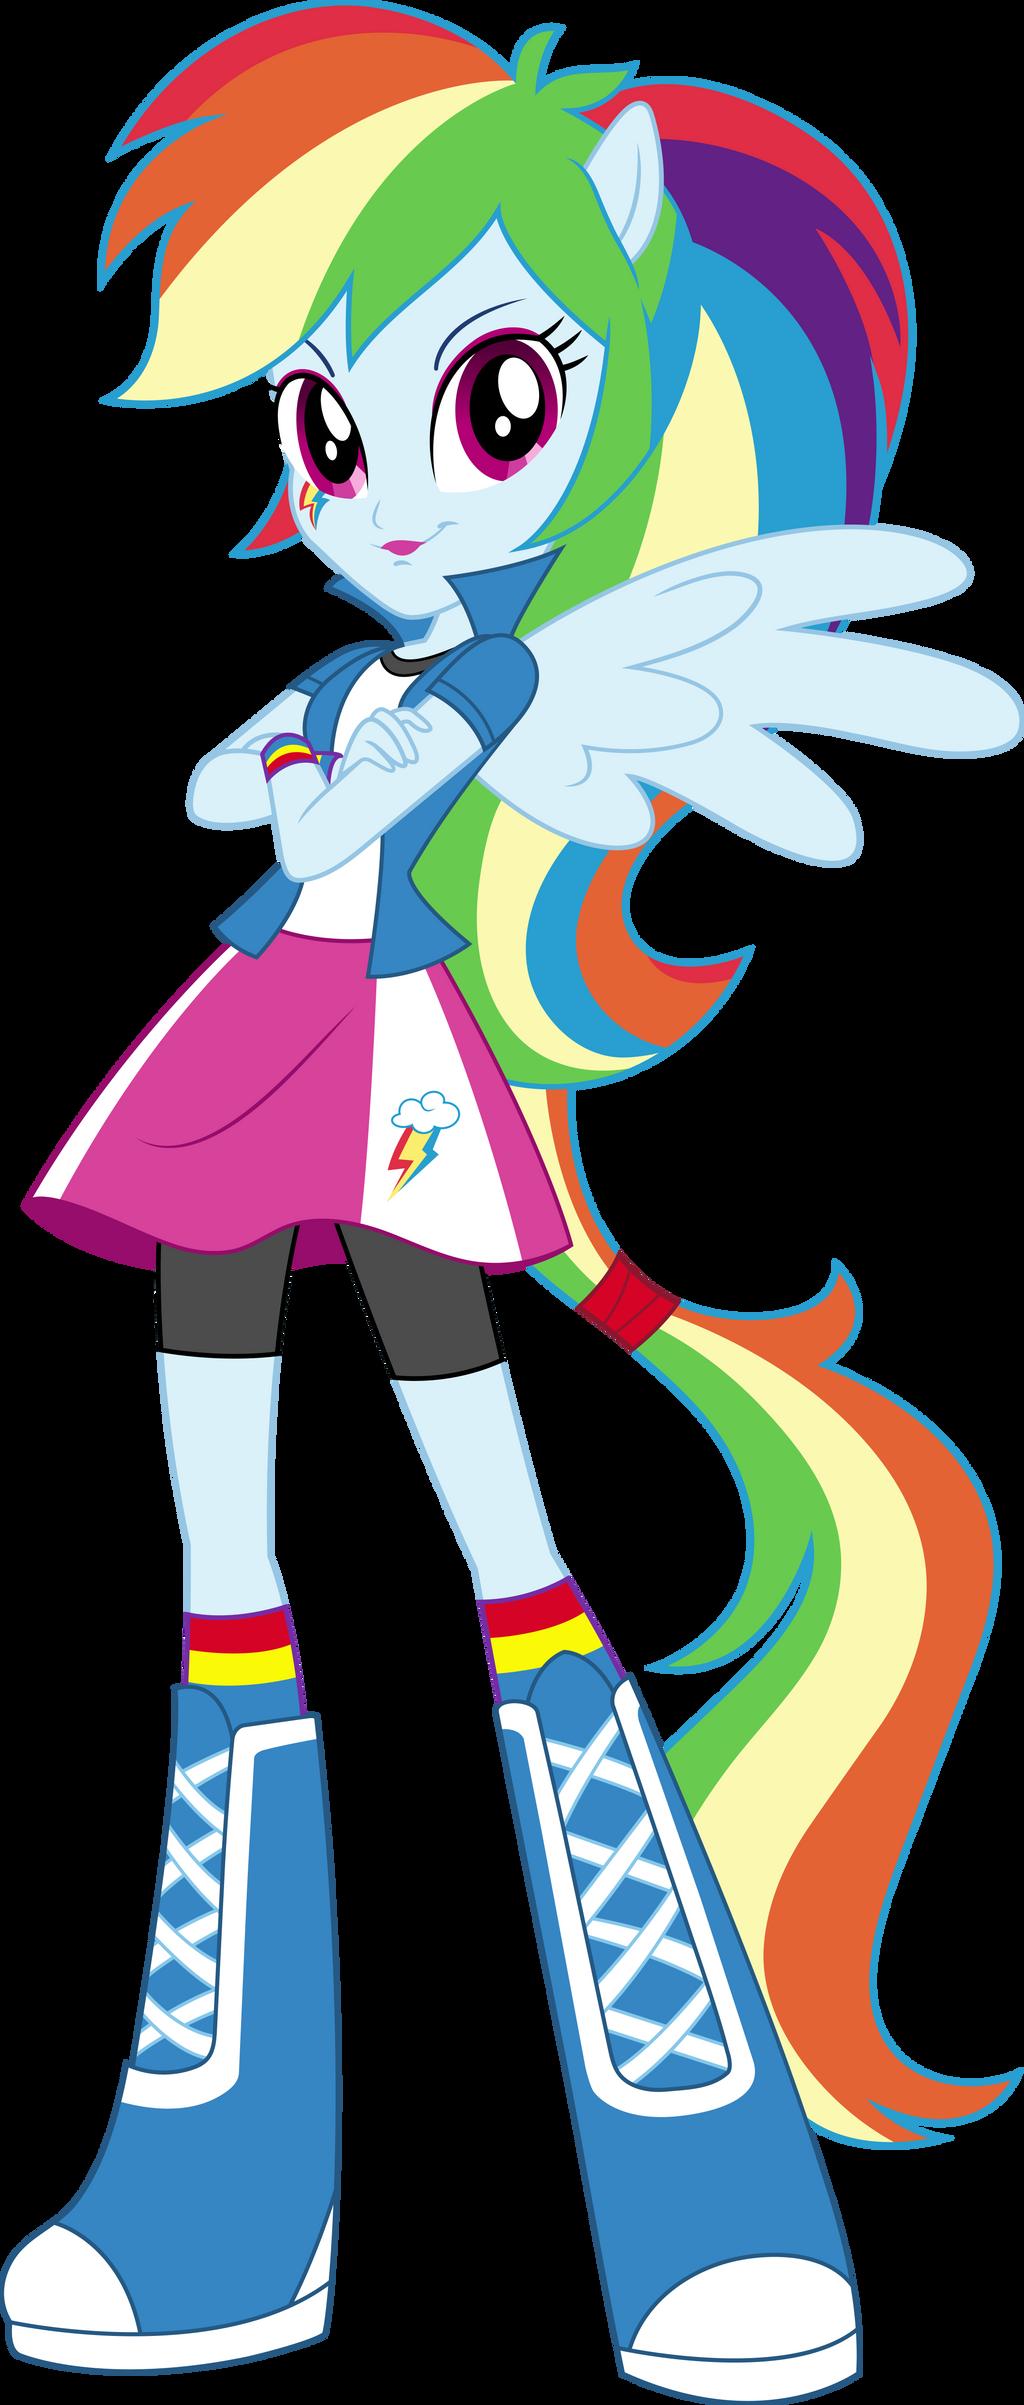 Mlp anthro rainbow dash - photo#49